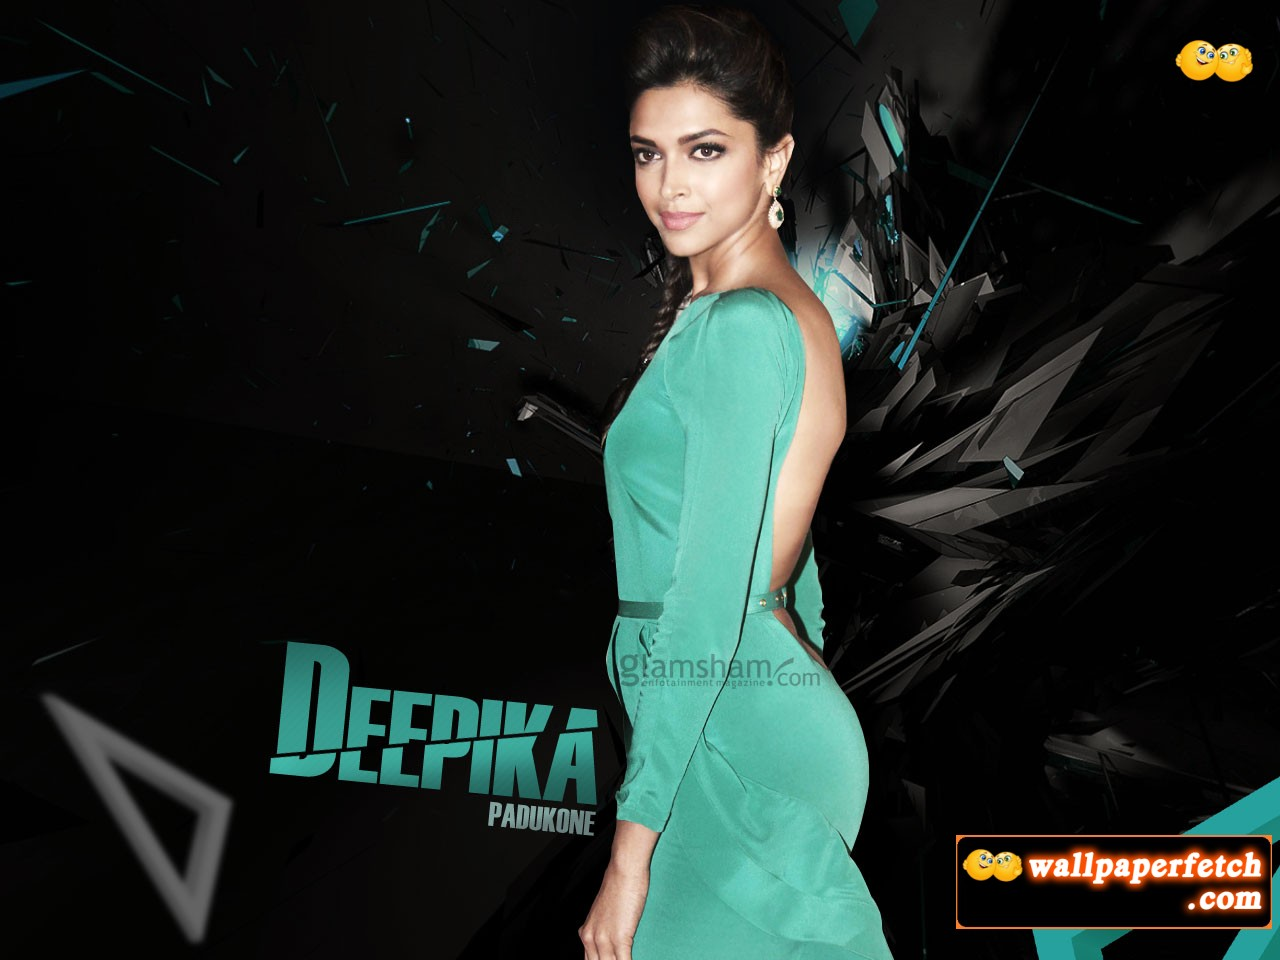 Wallpaper Fetch: Deepika Padukone Wallpapers 2012